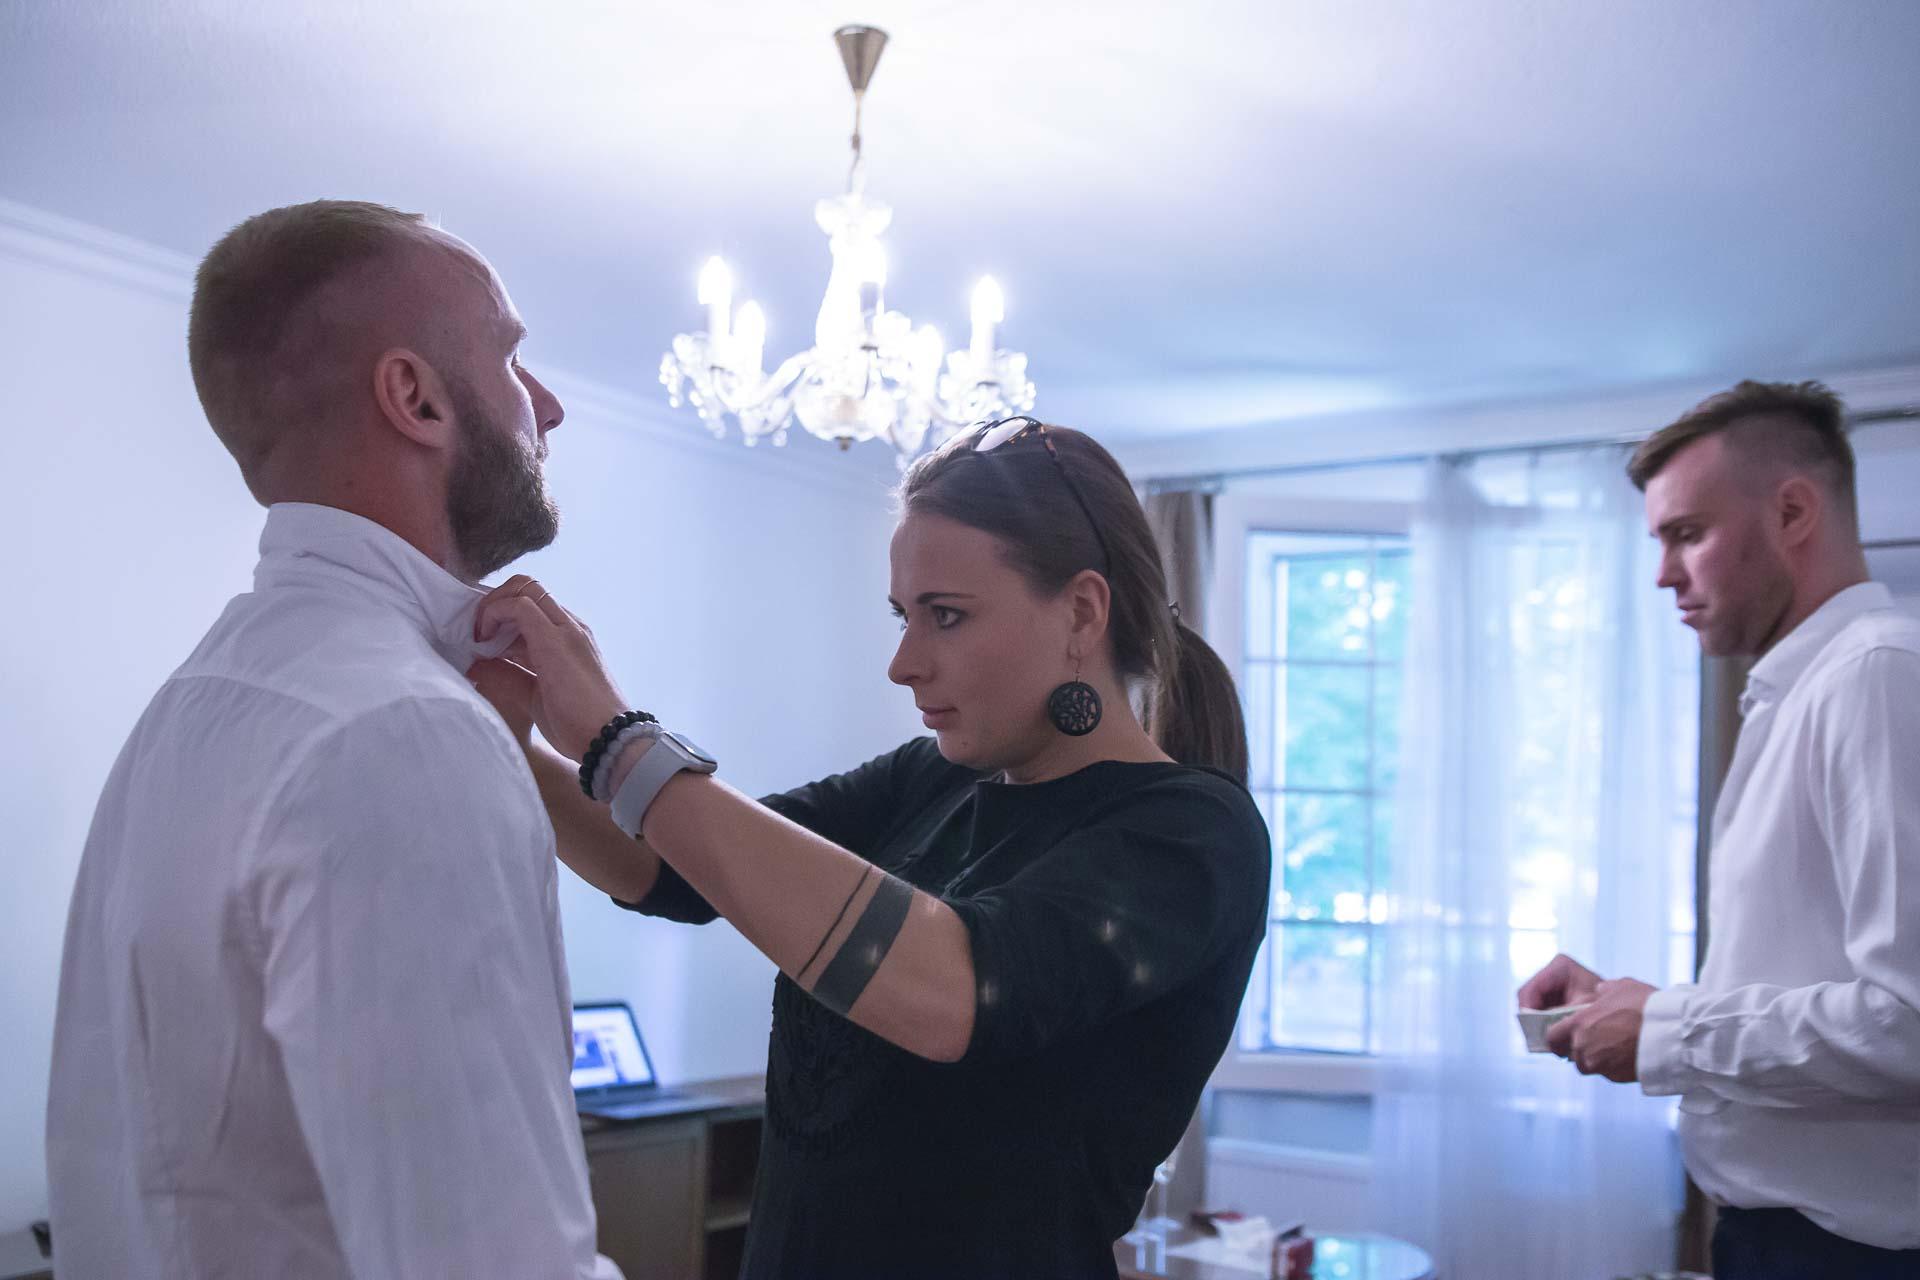 svatební-fotograf-svatebni-video-Nymburk-hotel-Ostrov-Beautyfoto-4887